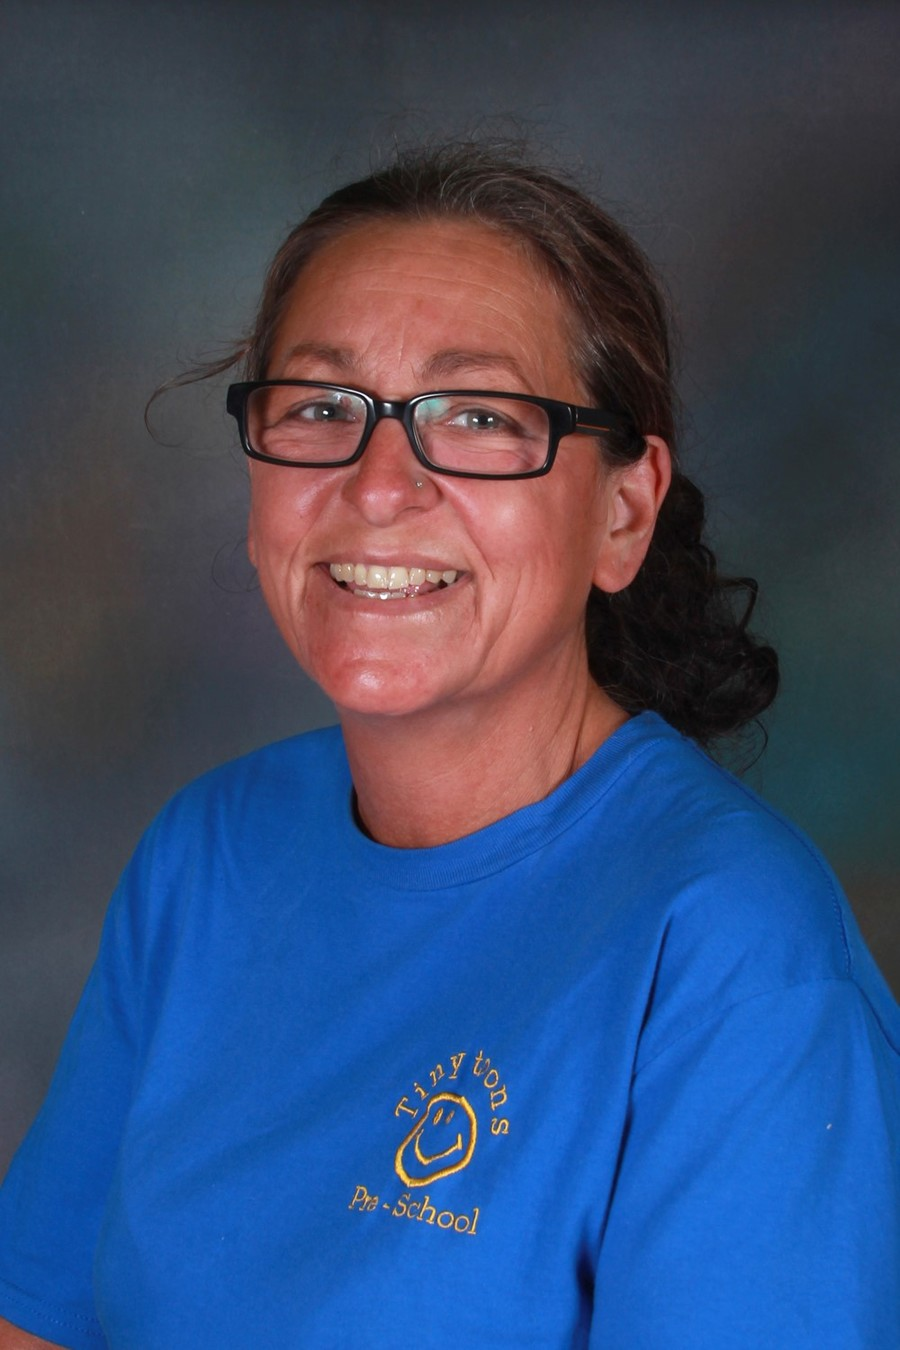 Mandy Lyons